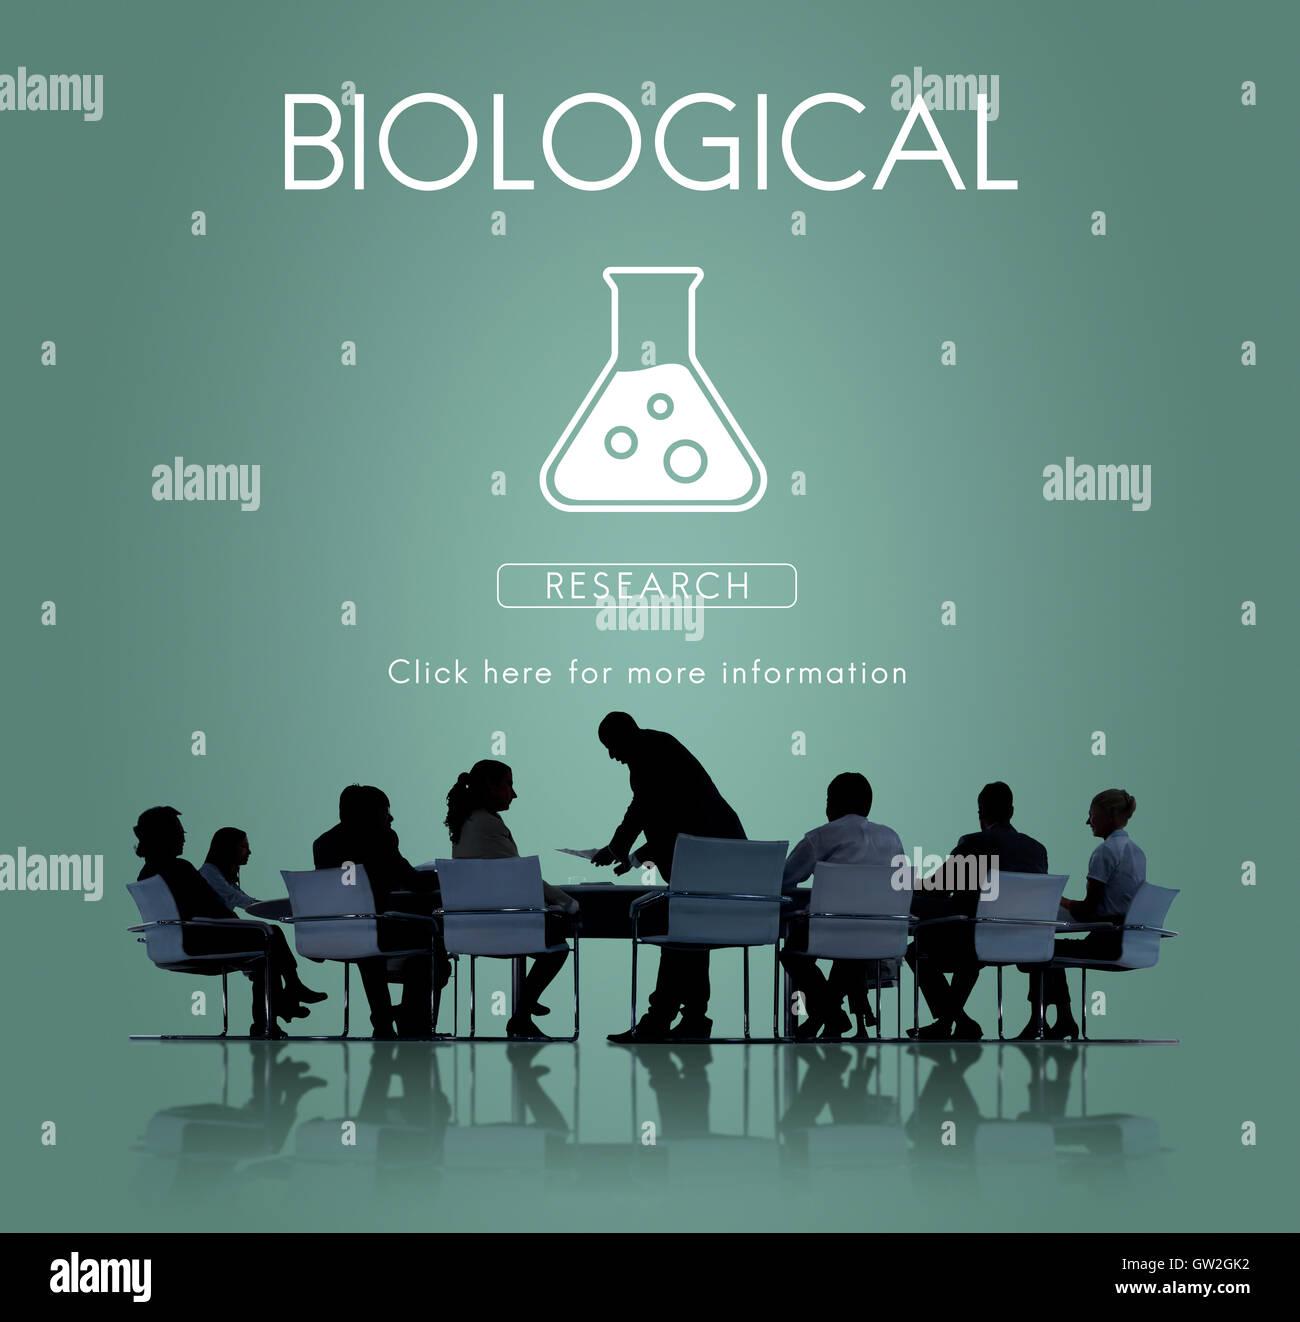 Scientific Biochemistry Genetics Engineering Concept - Stock Image